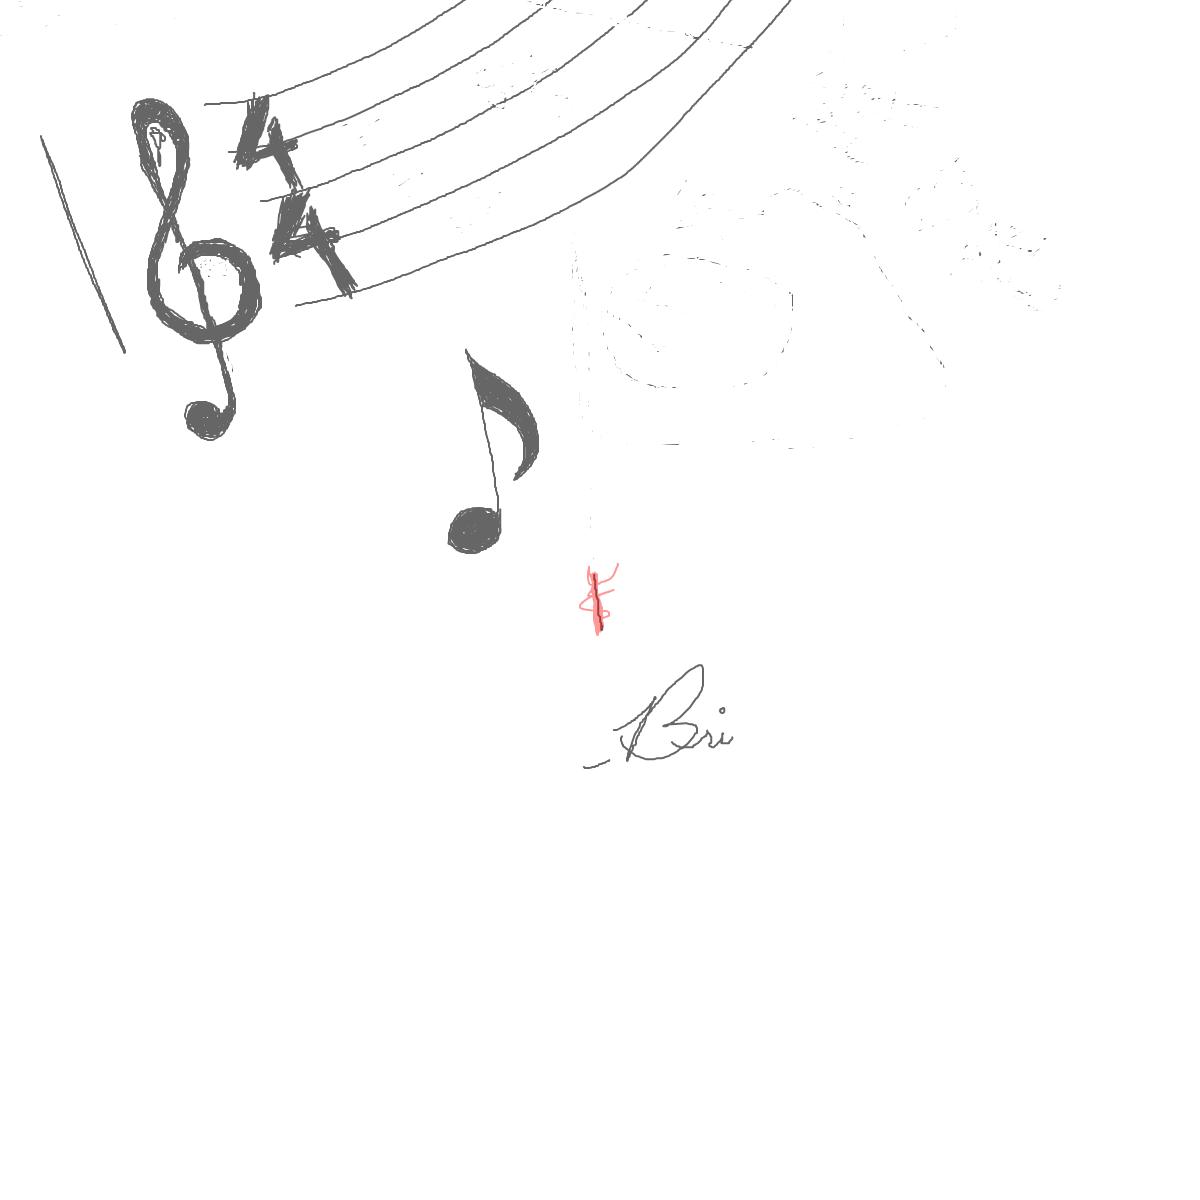 BAAAM drawing#13864 lat:39.7172012329101560lng: -75.6447296142578100